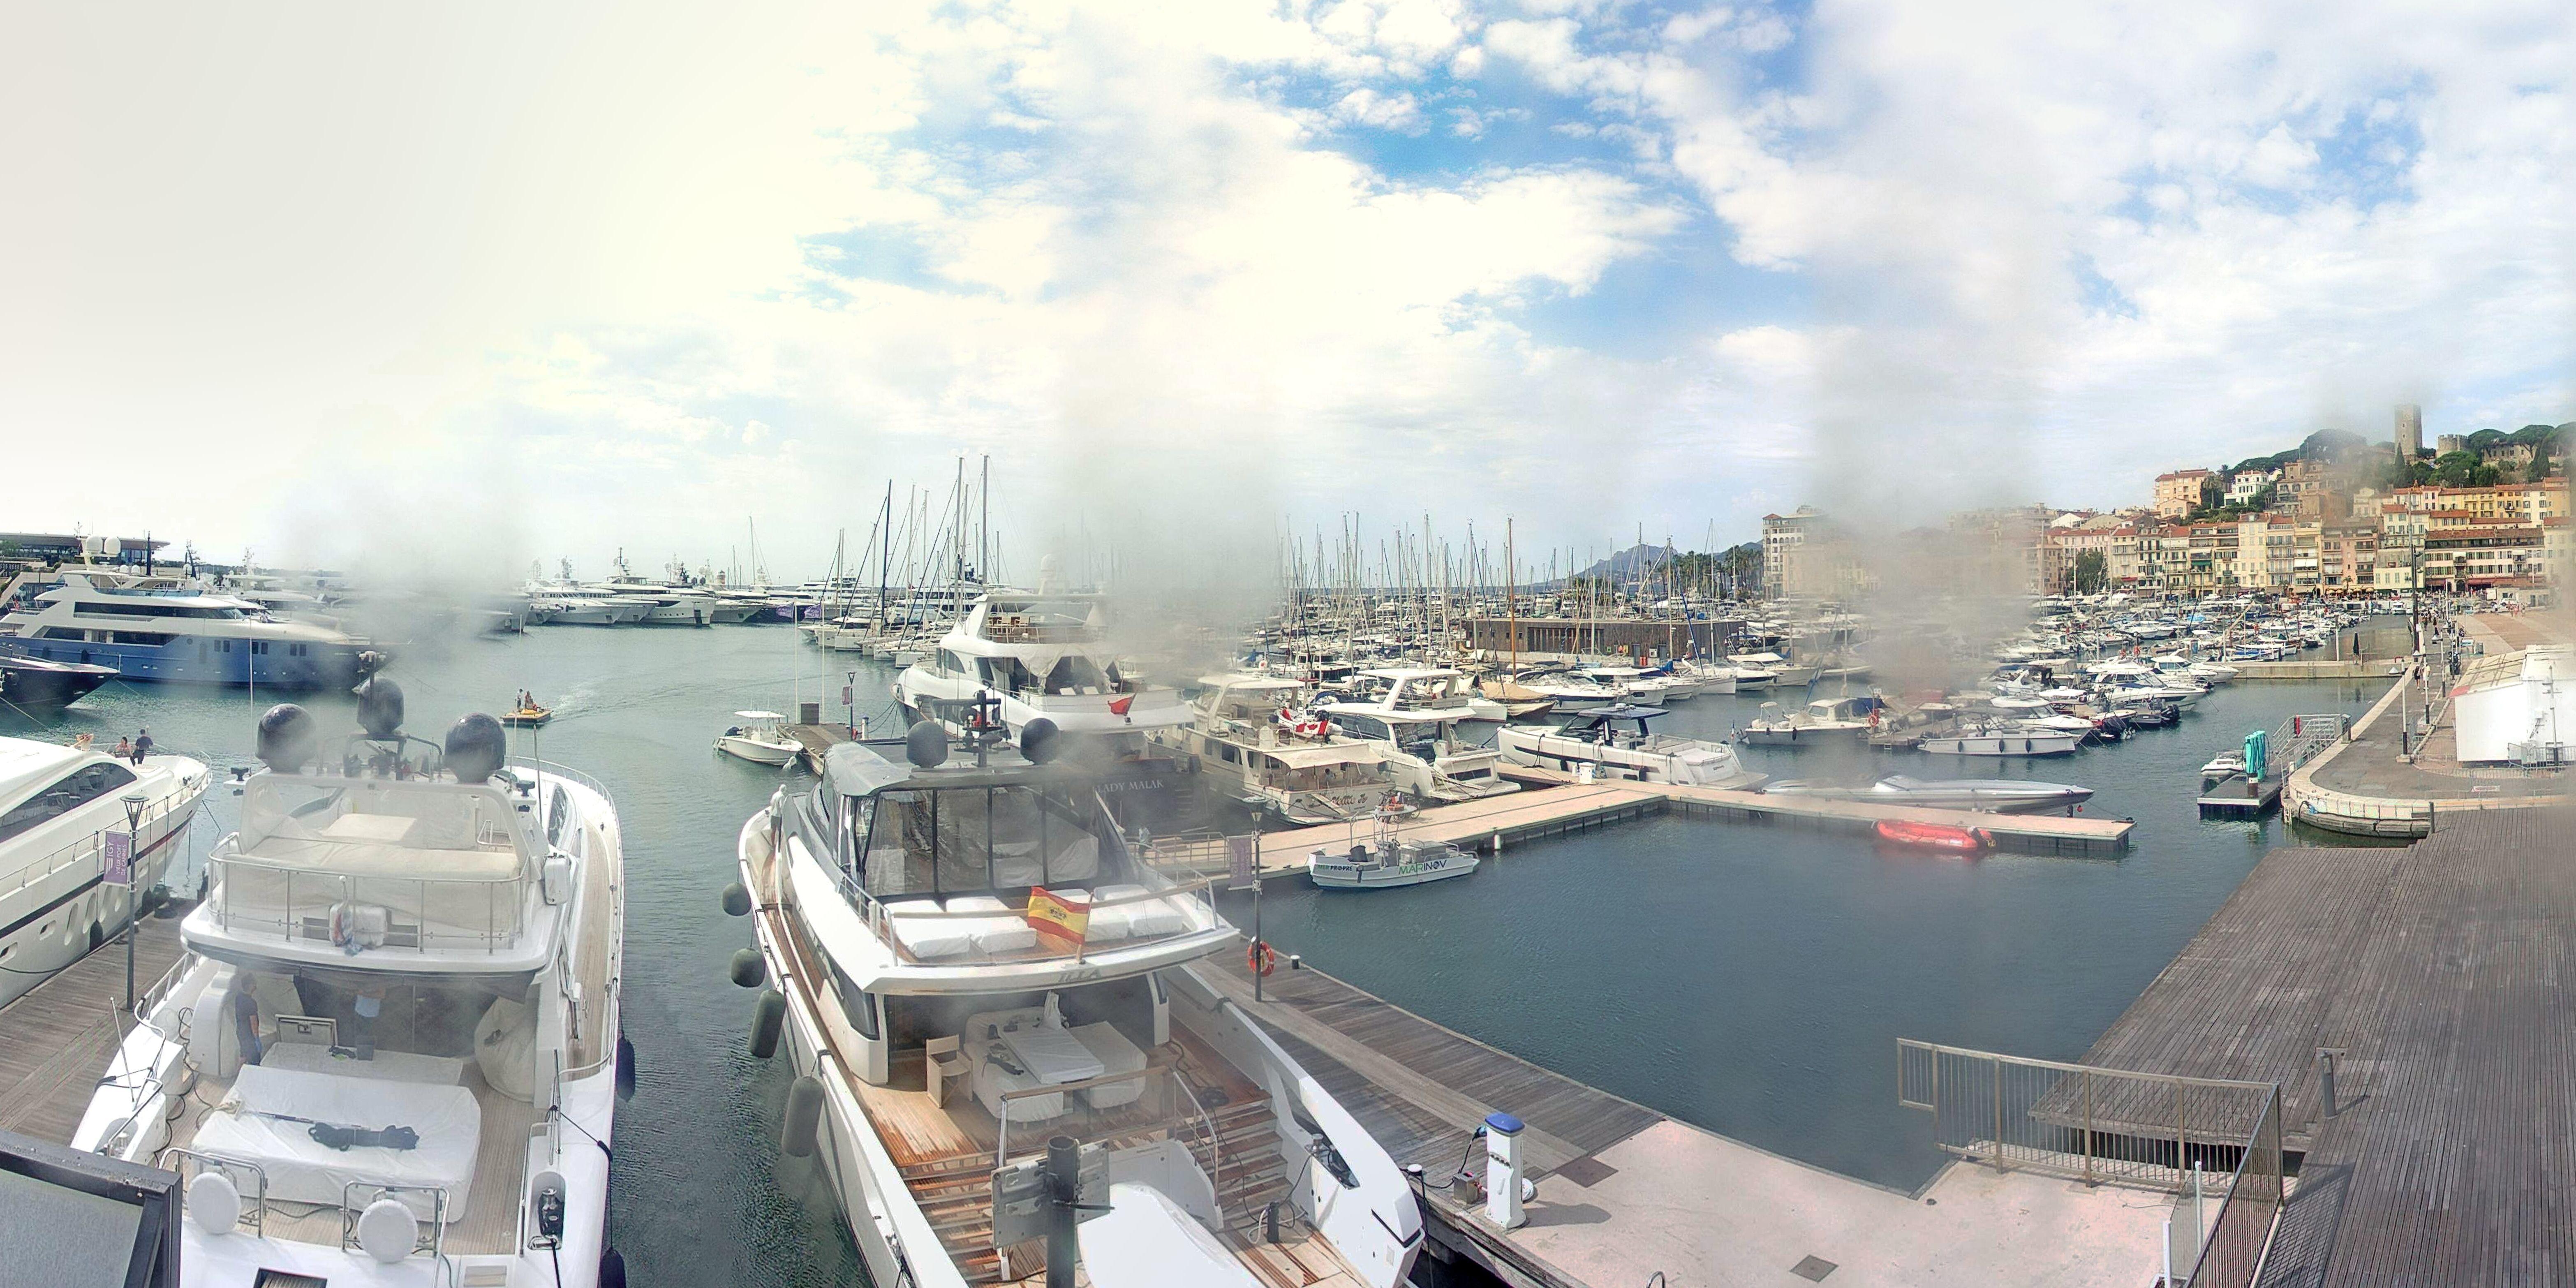 Cannes Thu. 12:35